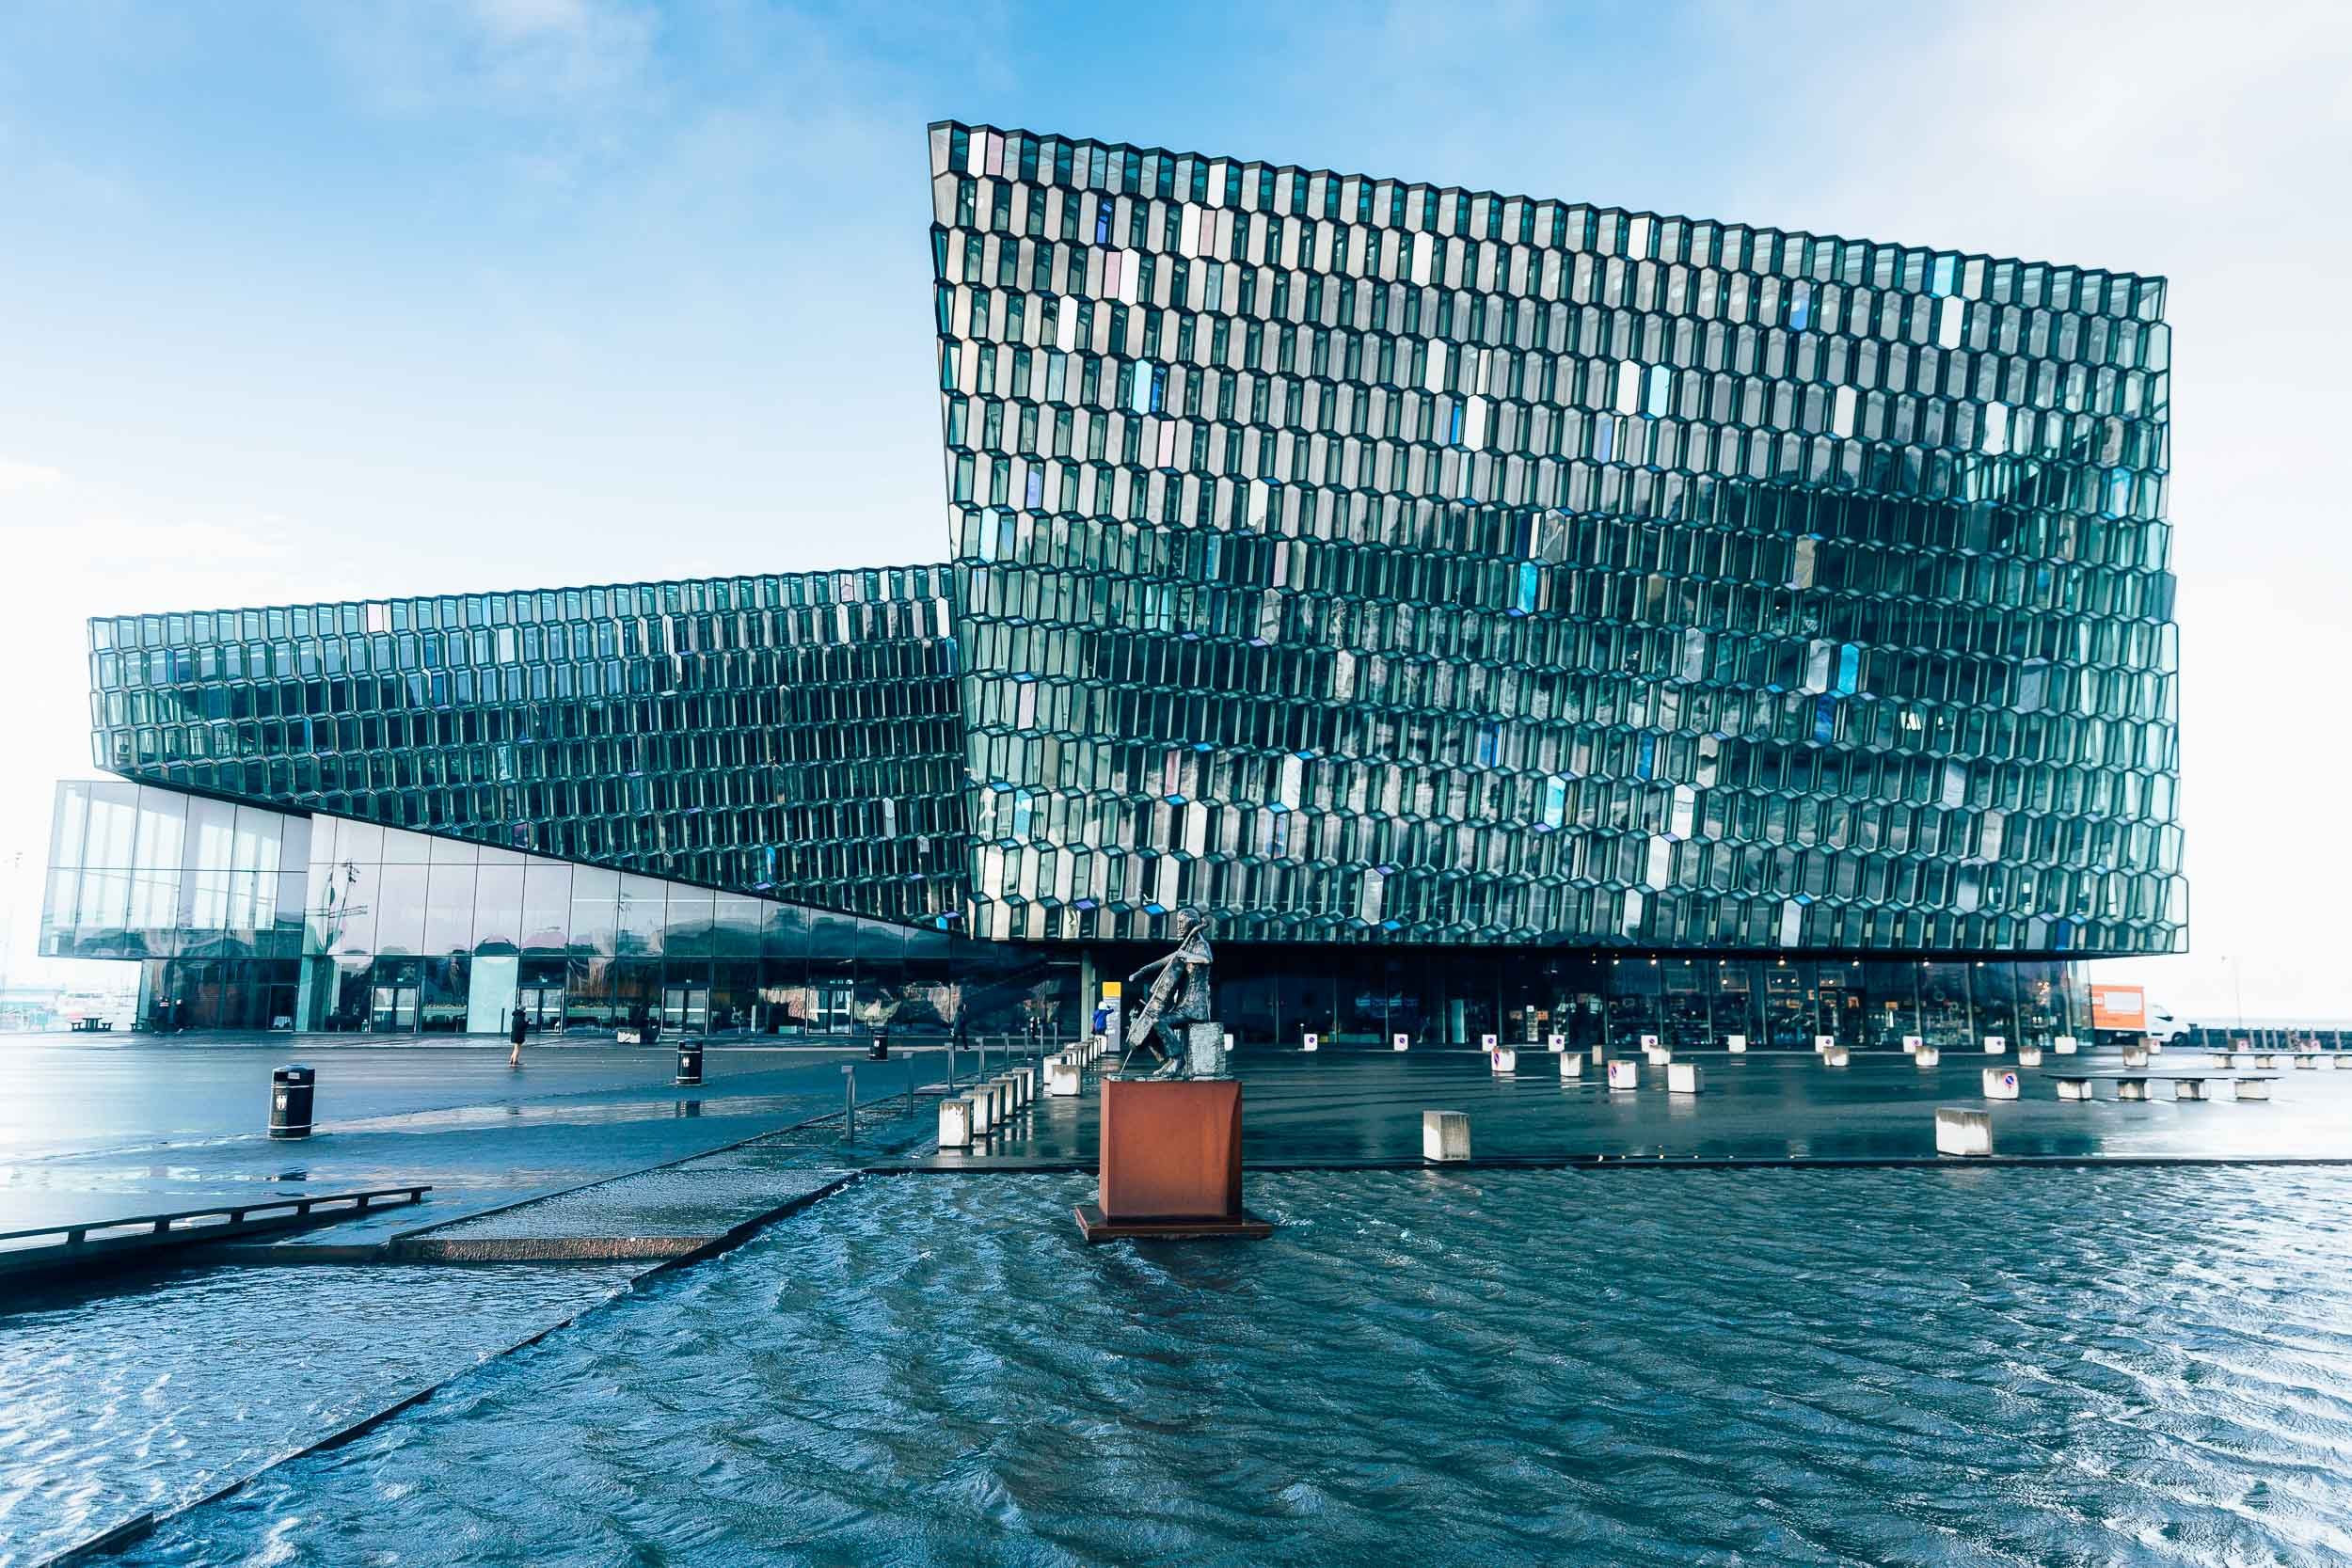 02_2019_Iceland-235.jpg